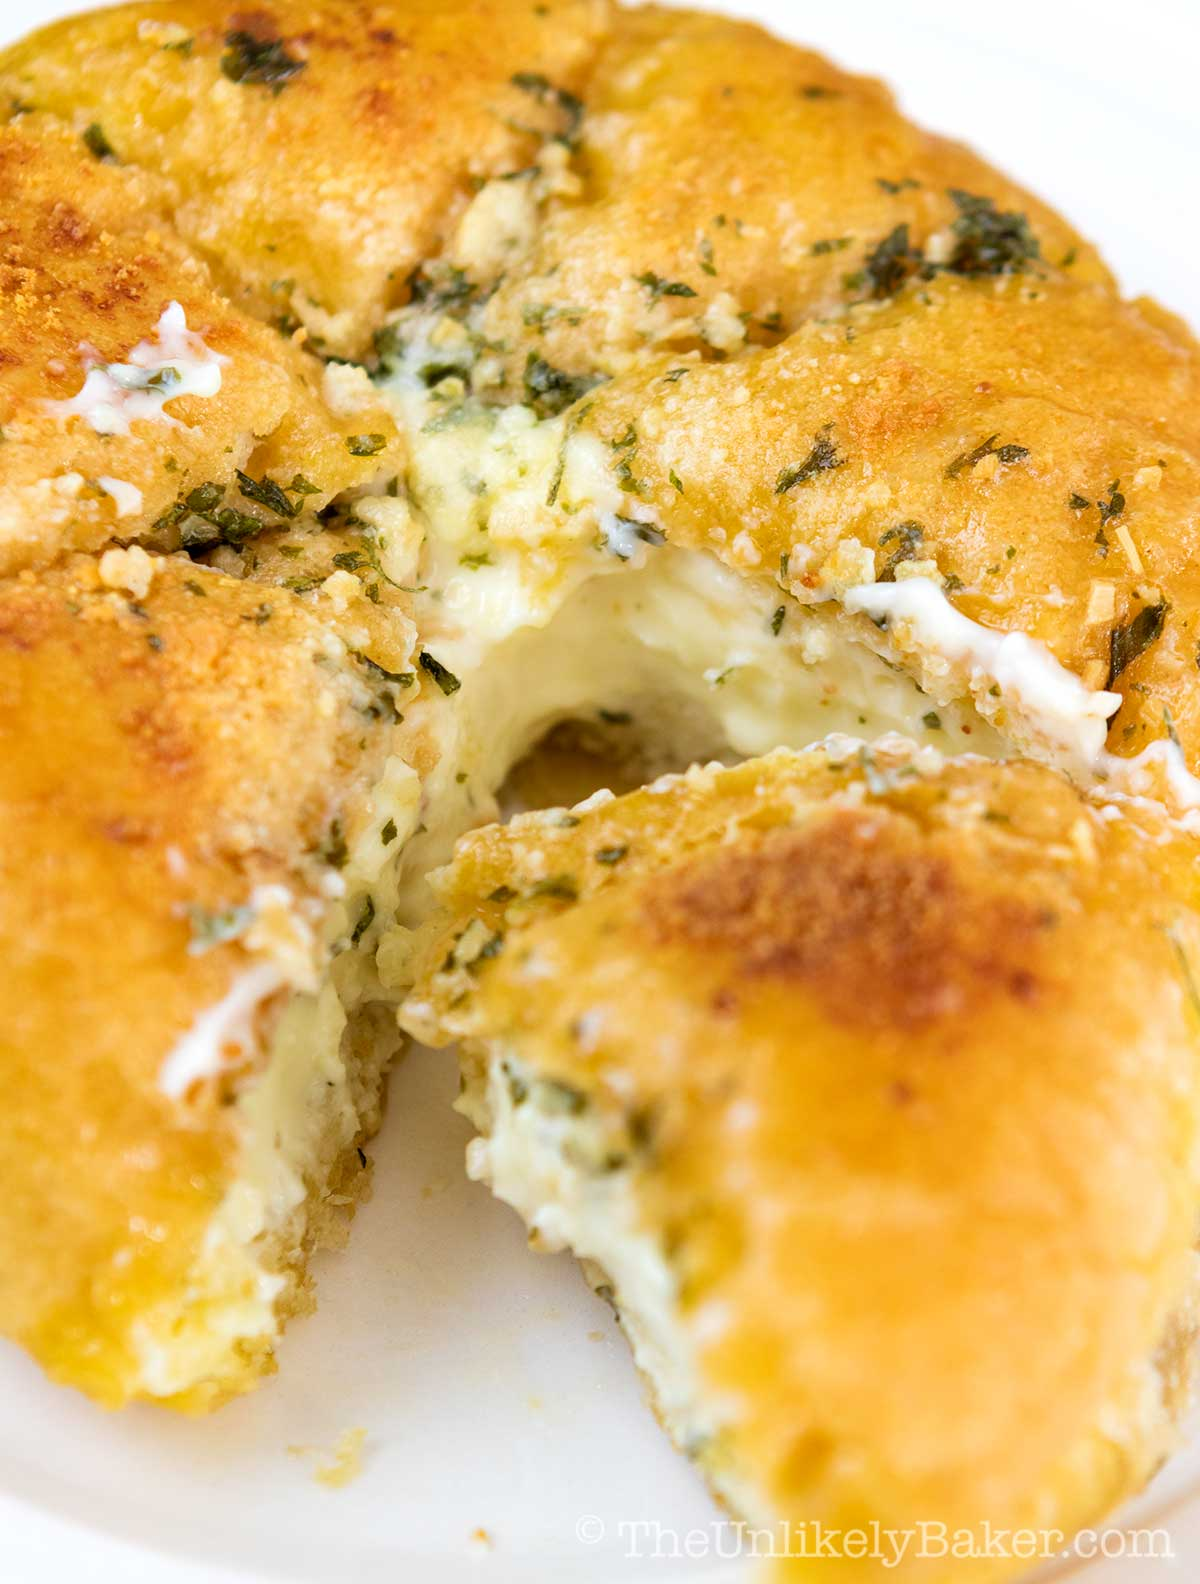 Korean Cream Cheese Garlic Bread - Easy and Simple Recipe